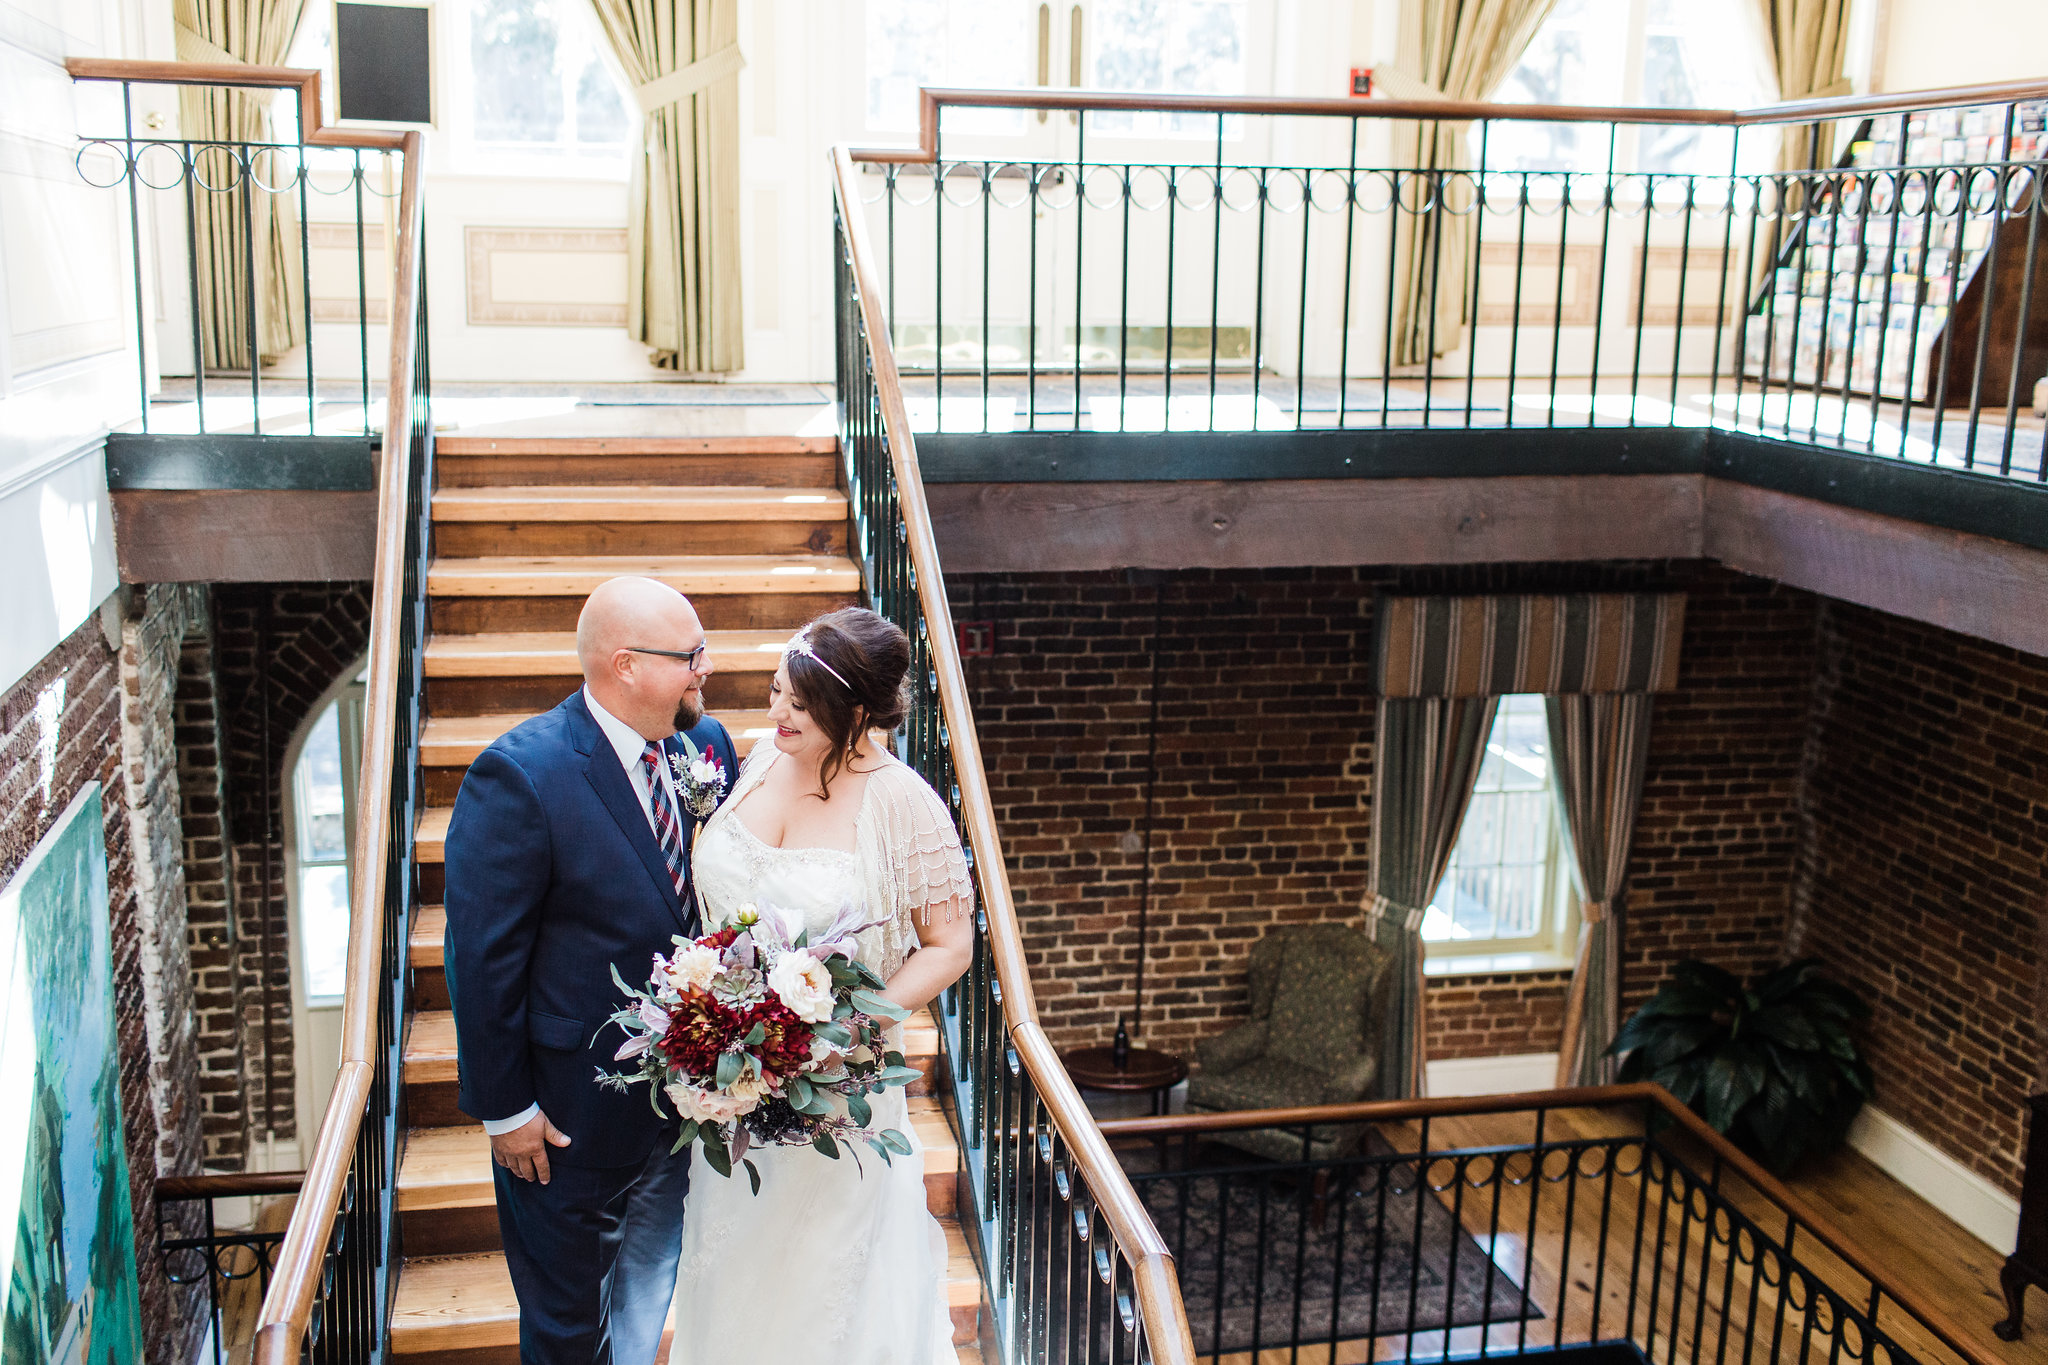 apt-b-photography-kristy-rob-wormsloe-elopment-savannah-wedding-photographer-savannah-elopement-wormsloe-wedding-historic-savannah-16.jpg